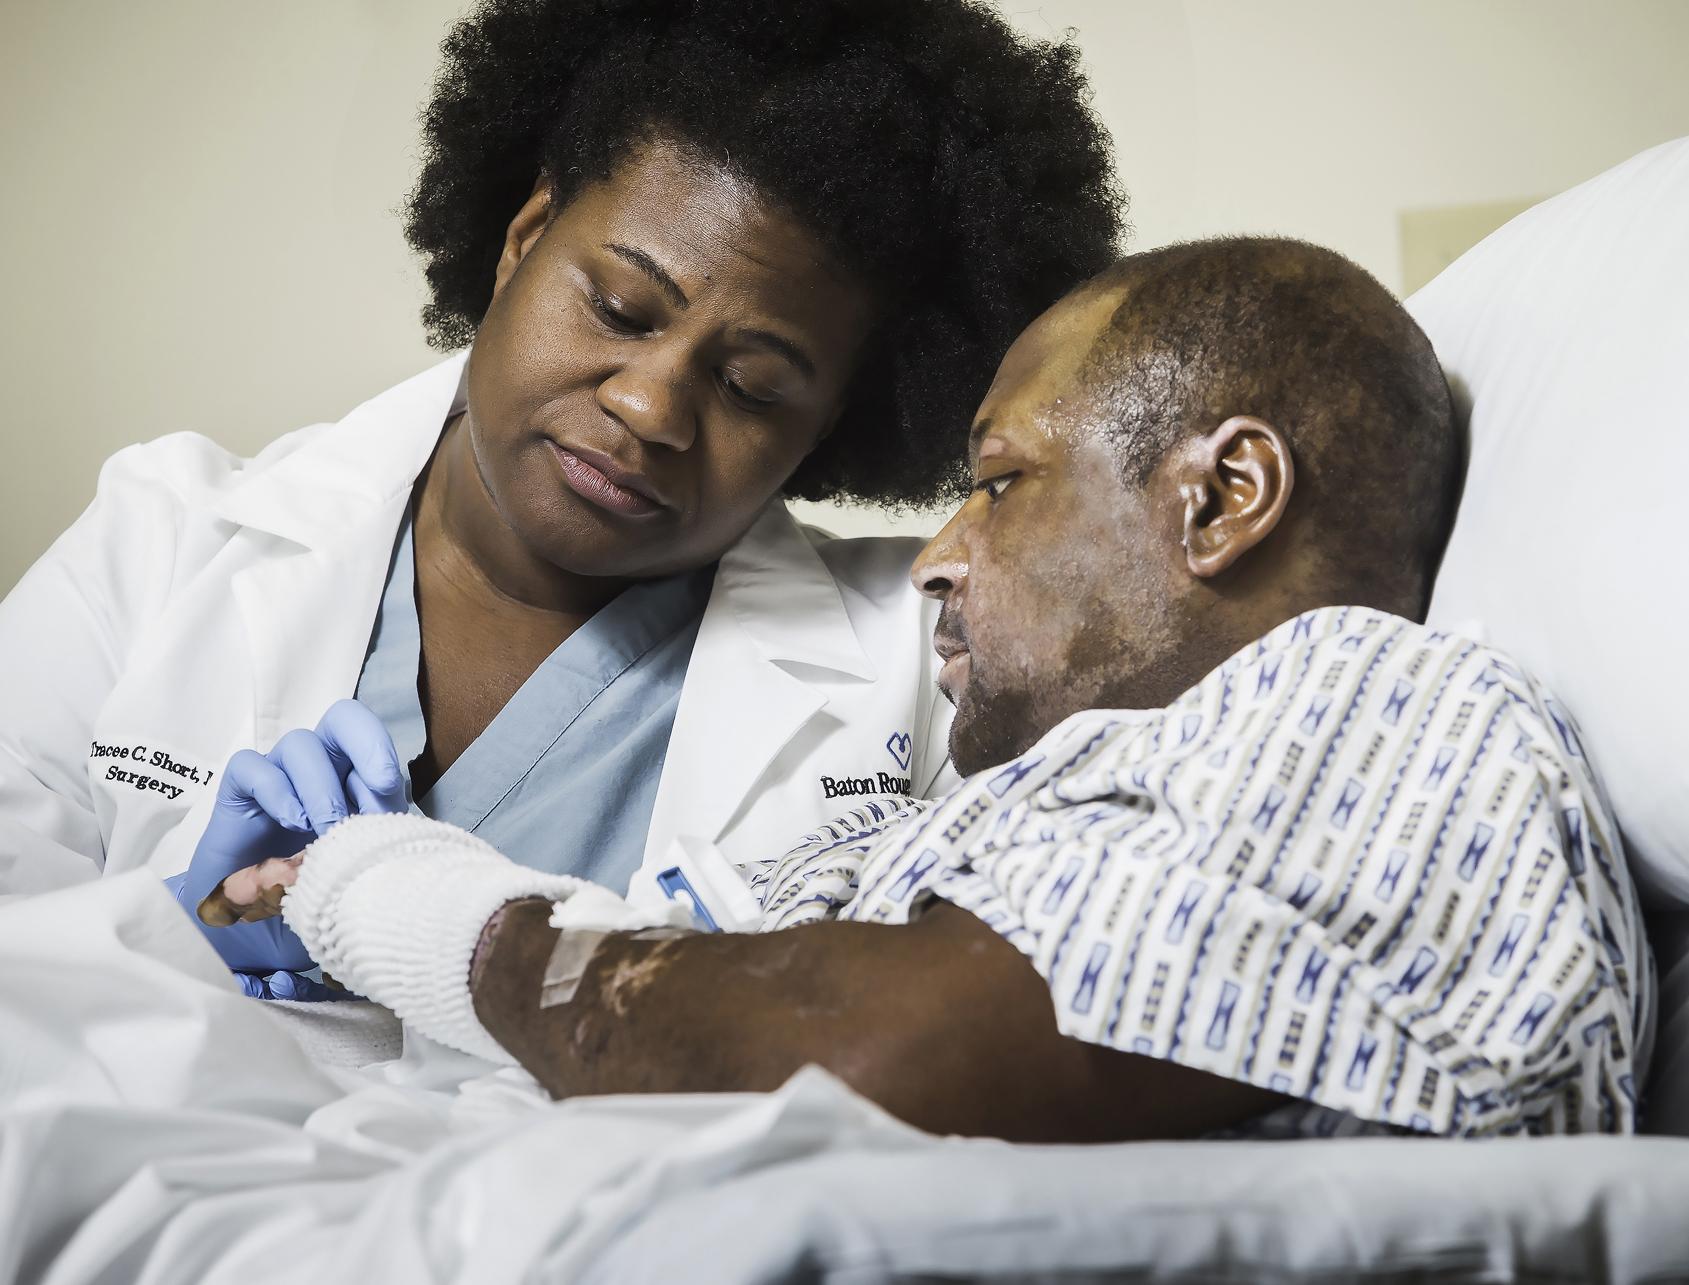 ... Lynel East, Jr. at the Baton Rouge General Medical Center's Burn Unit